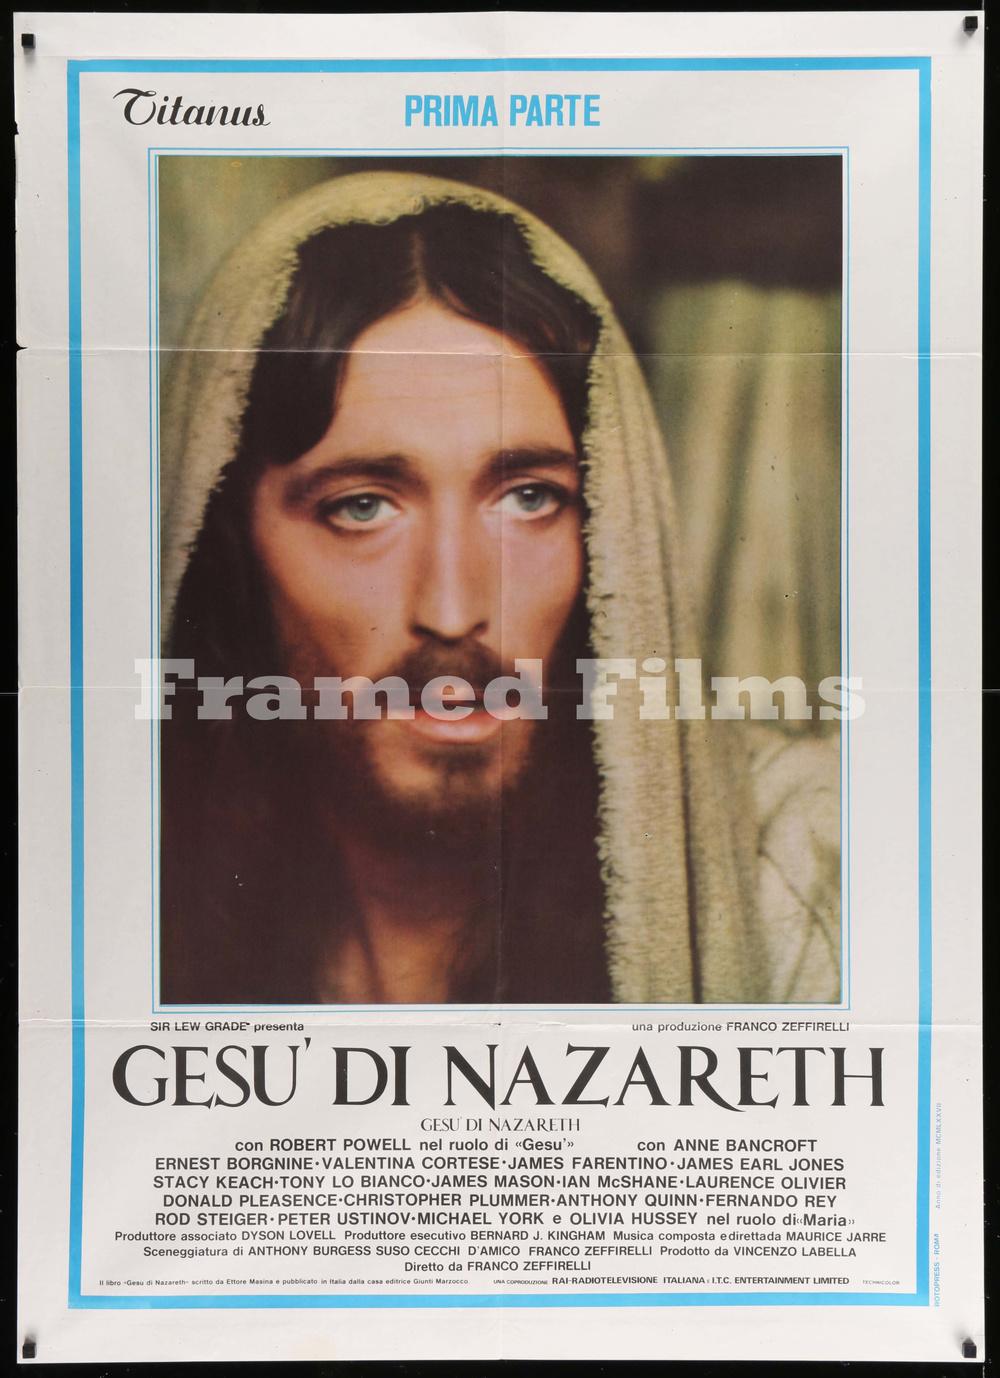 italian_1p_jesus_of_nazareth_dupe1_BM05603_L.jpg